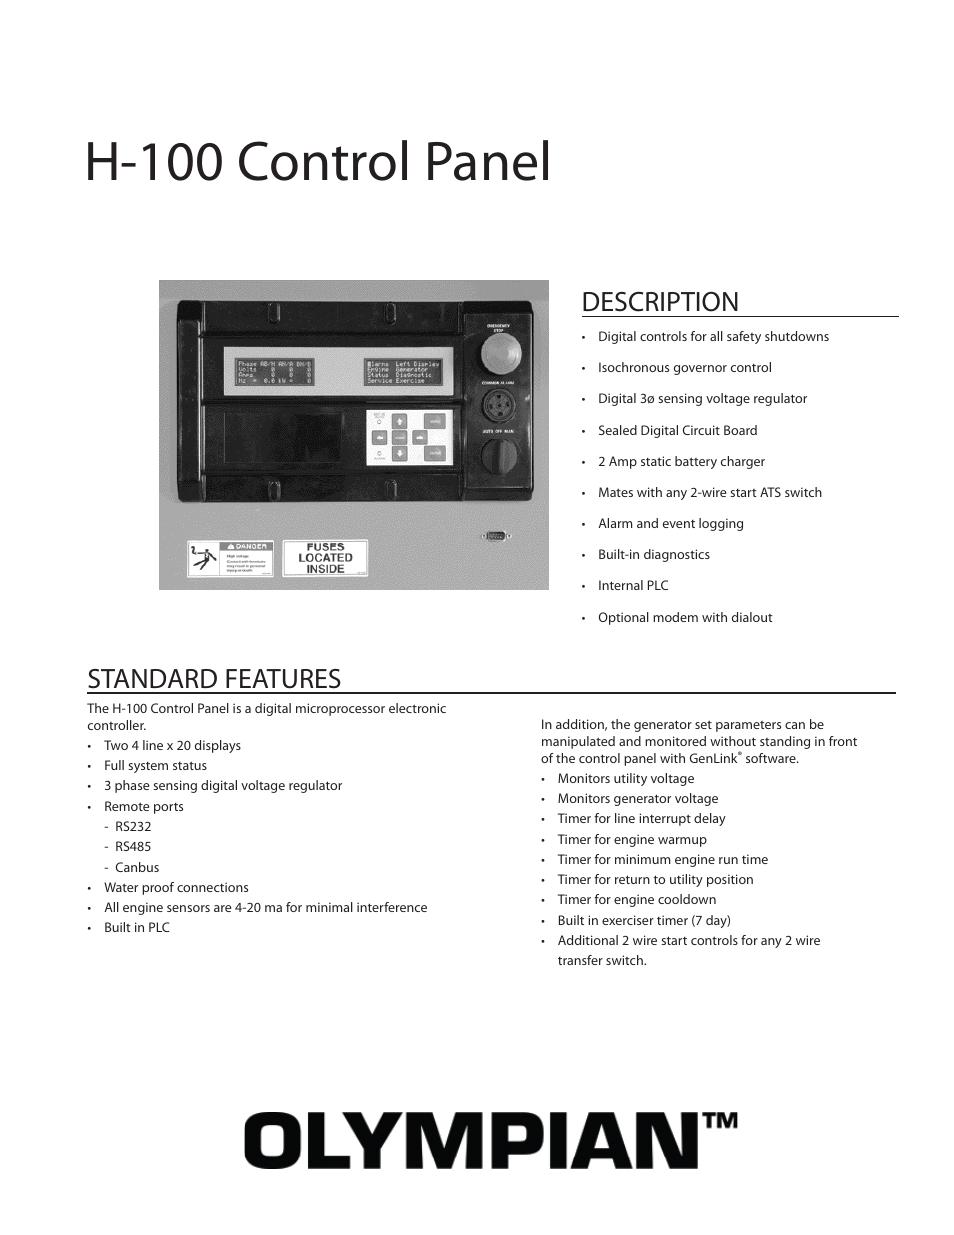 Milton CAT G200LG4 200kW_250kVA H-100 Control Panel User Manual | 2 pages |  Also for: G300LG 300kW_375kVA H-100 Control Panel, G35LG 35 kW H-100  Control PanelManuals Directory